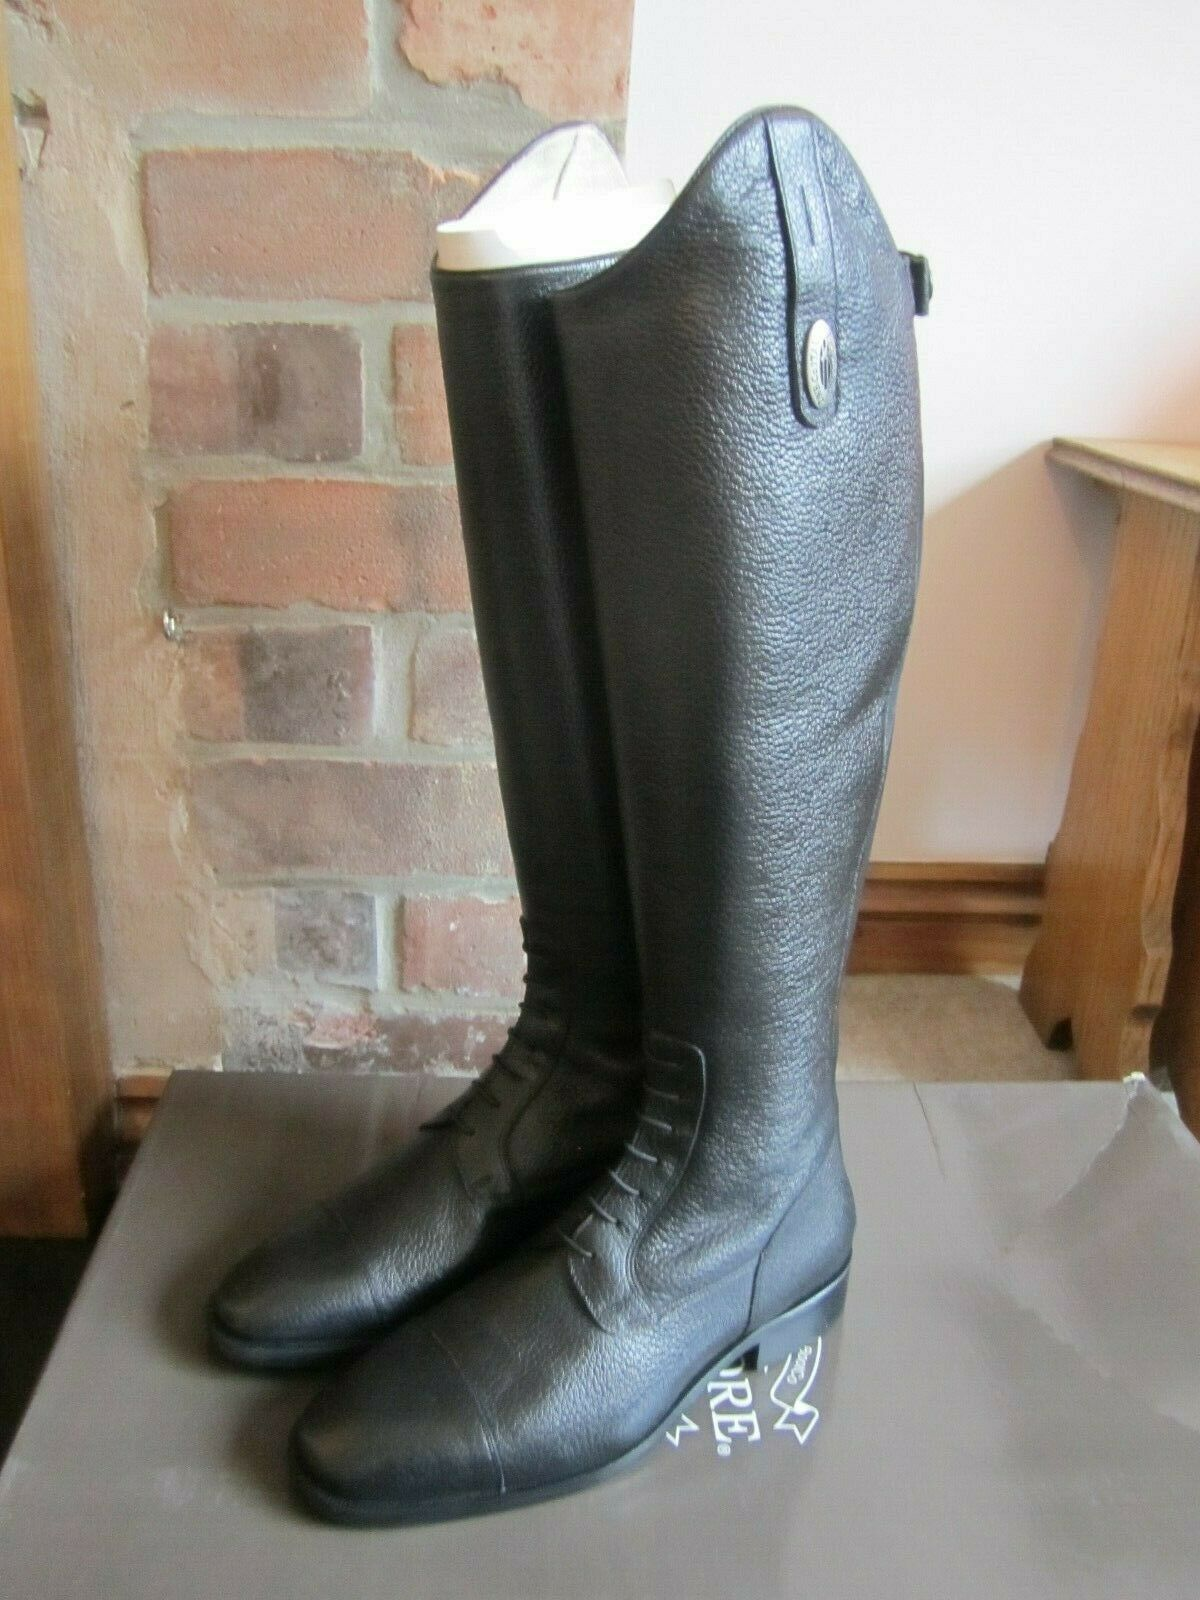 De Niro S3312 de largo de cuero botas de Montar-EU40 UK6.5 (mc M) - Negro-Ex DisJugar